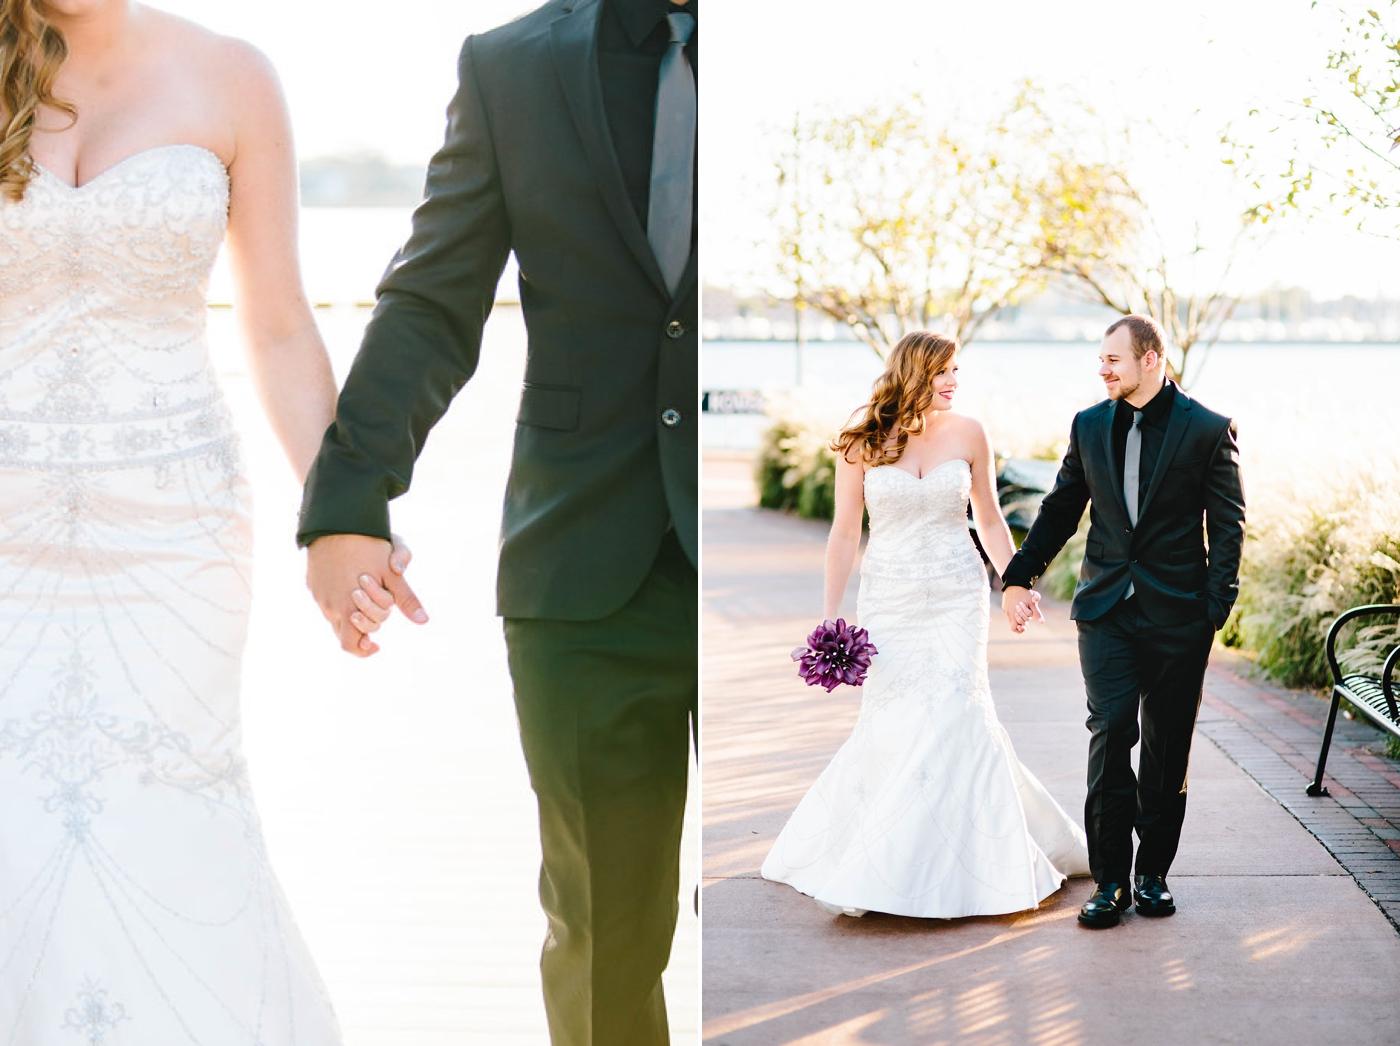 chicago-fine-art-wedding-photography-burnette13